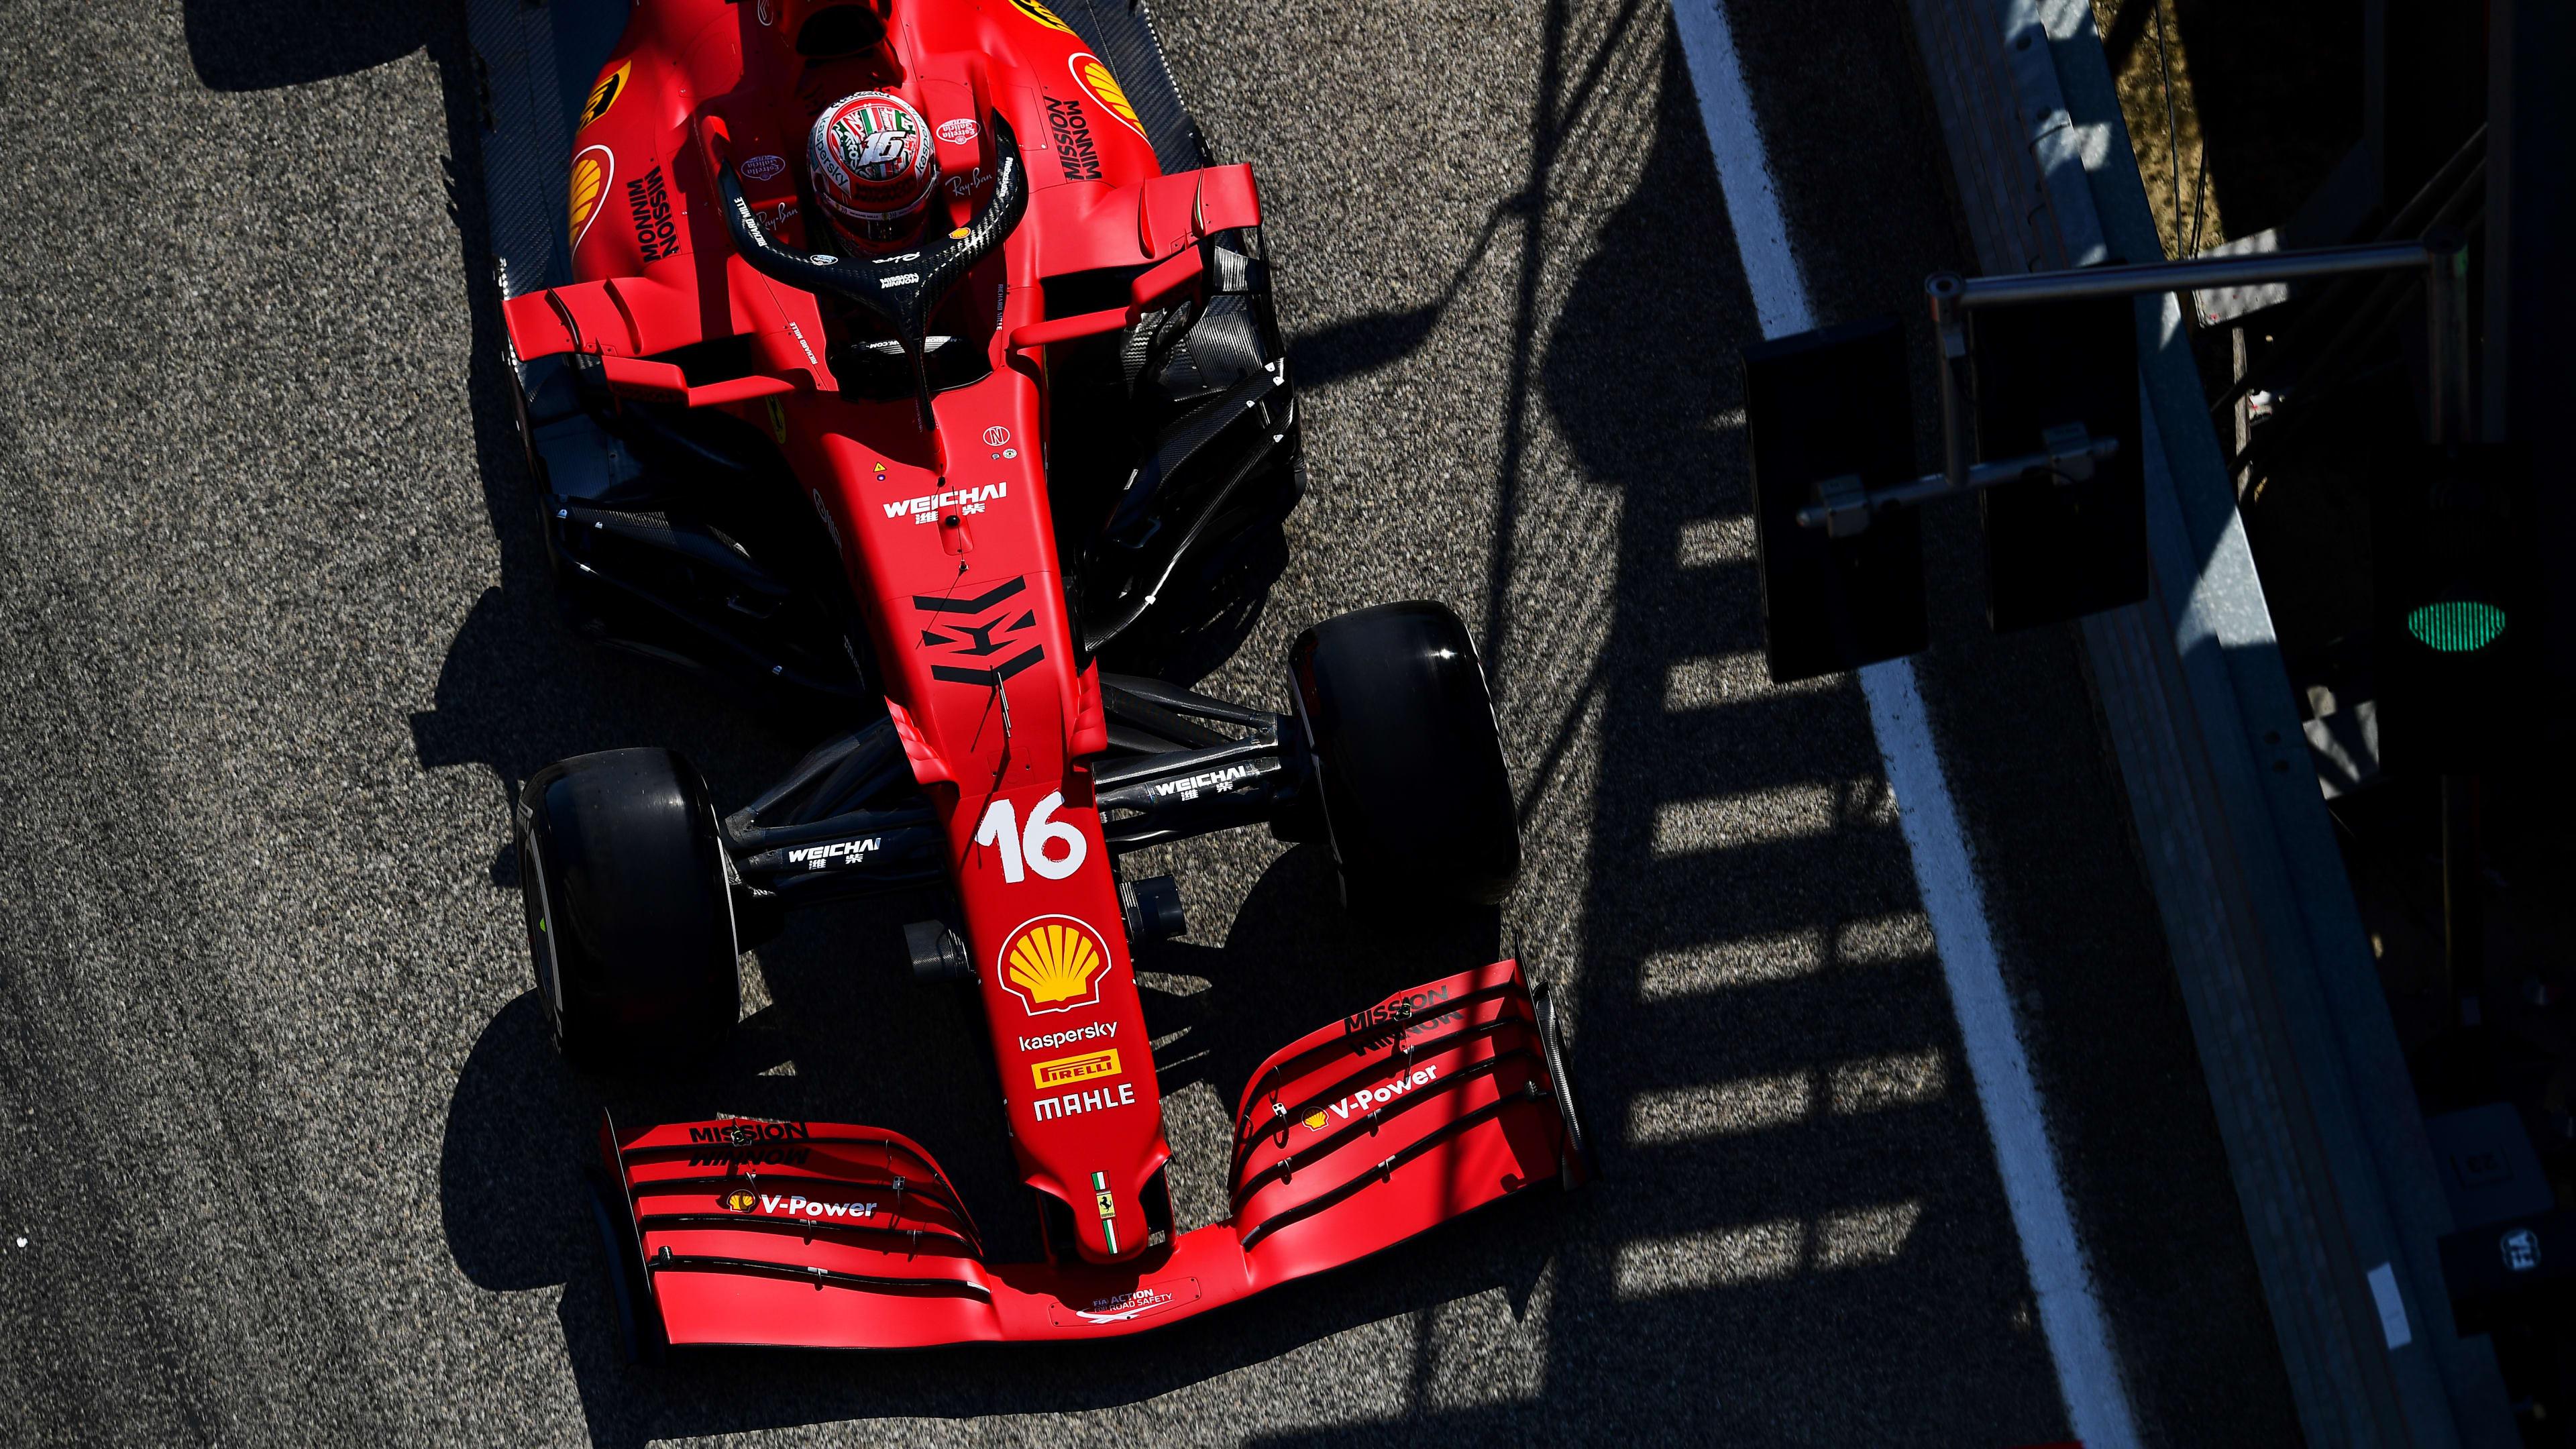 A lot of positives' for Ferrari despite FP2-ending crash, says Leclerc |  Formula 1®